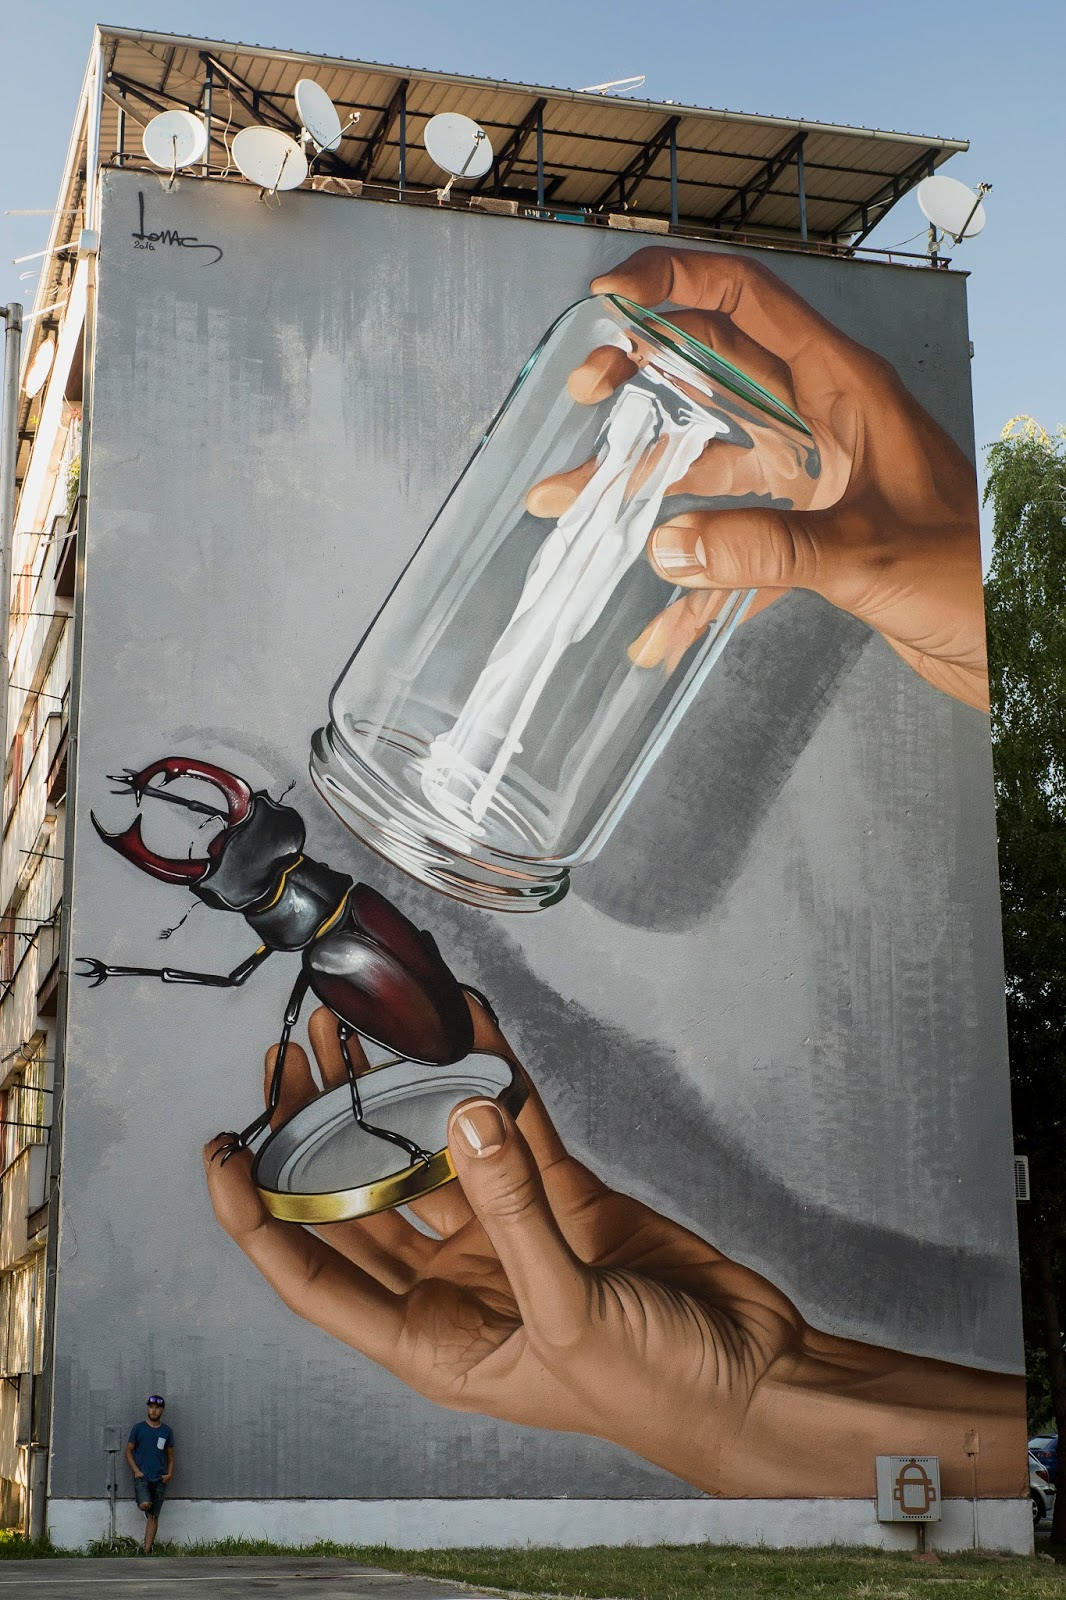 Lonac Photorealistic Murals Street Art Artpeople Net